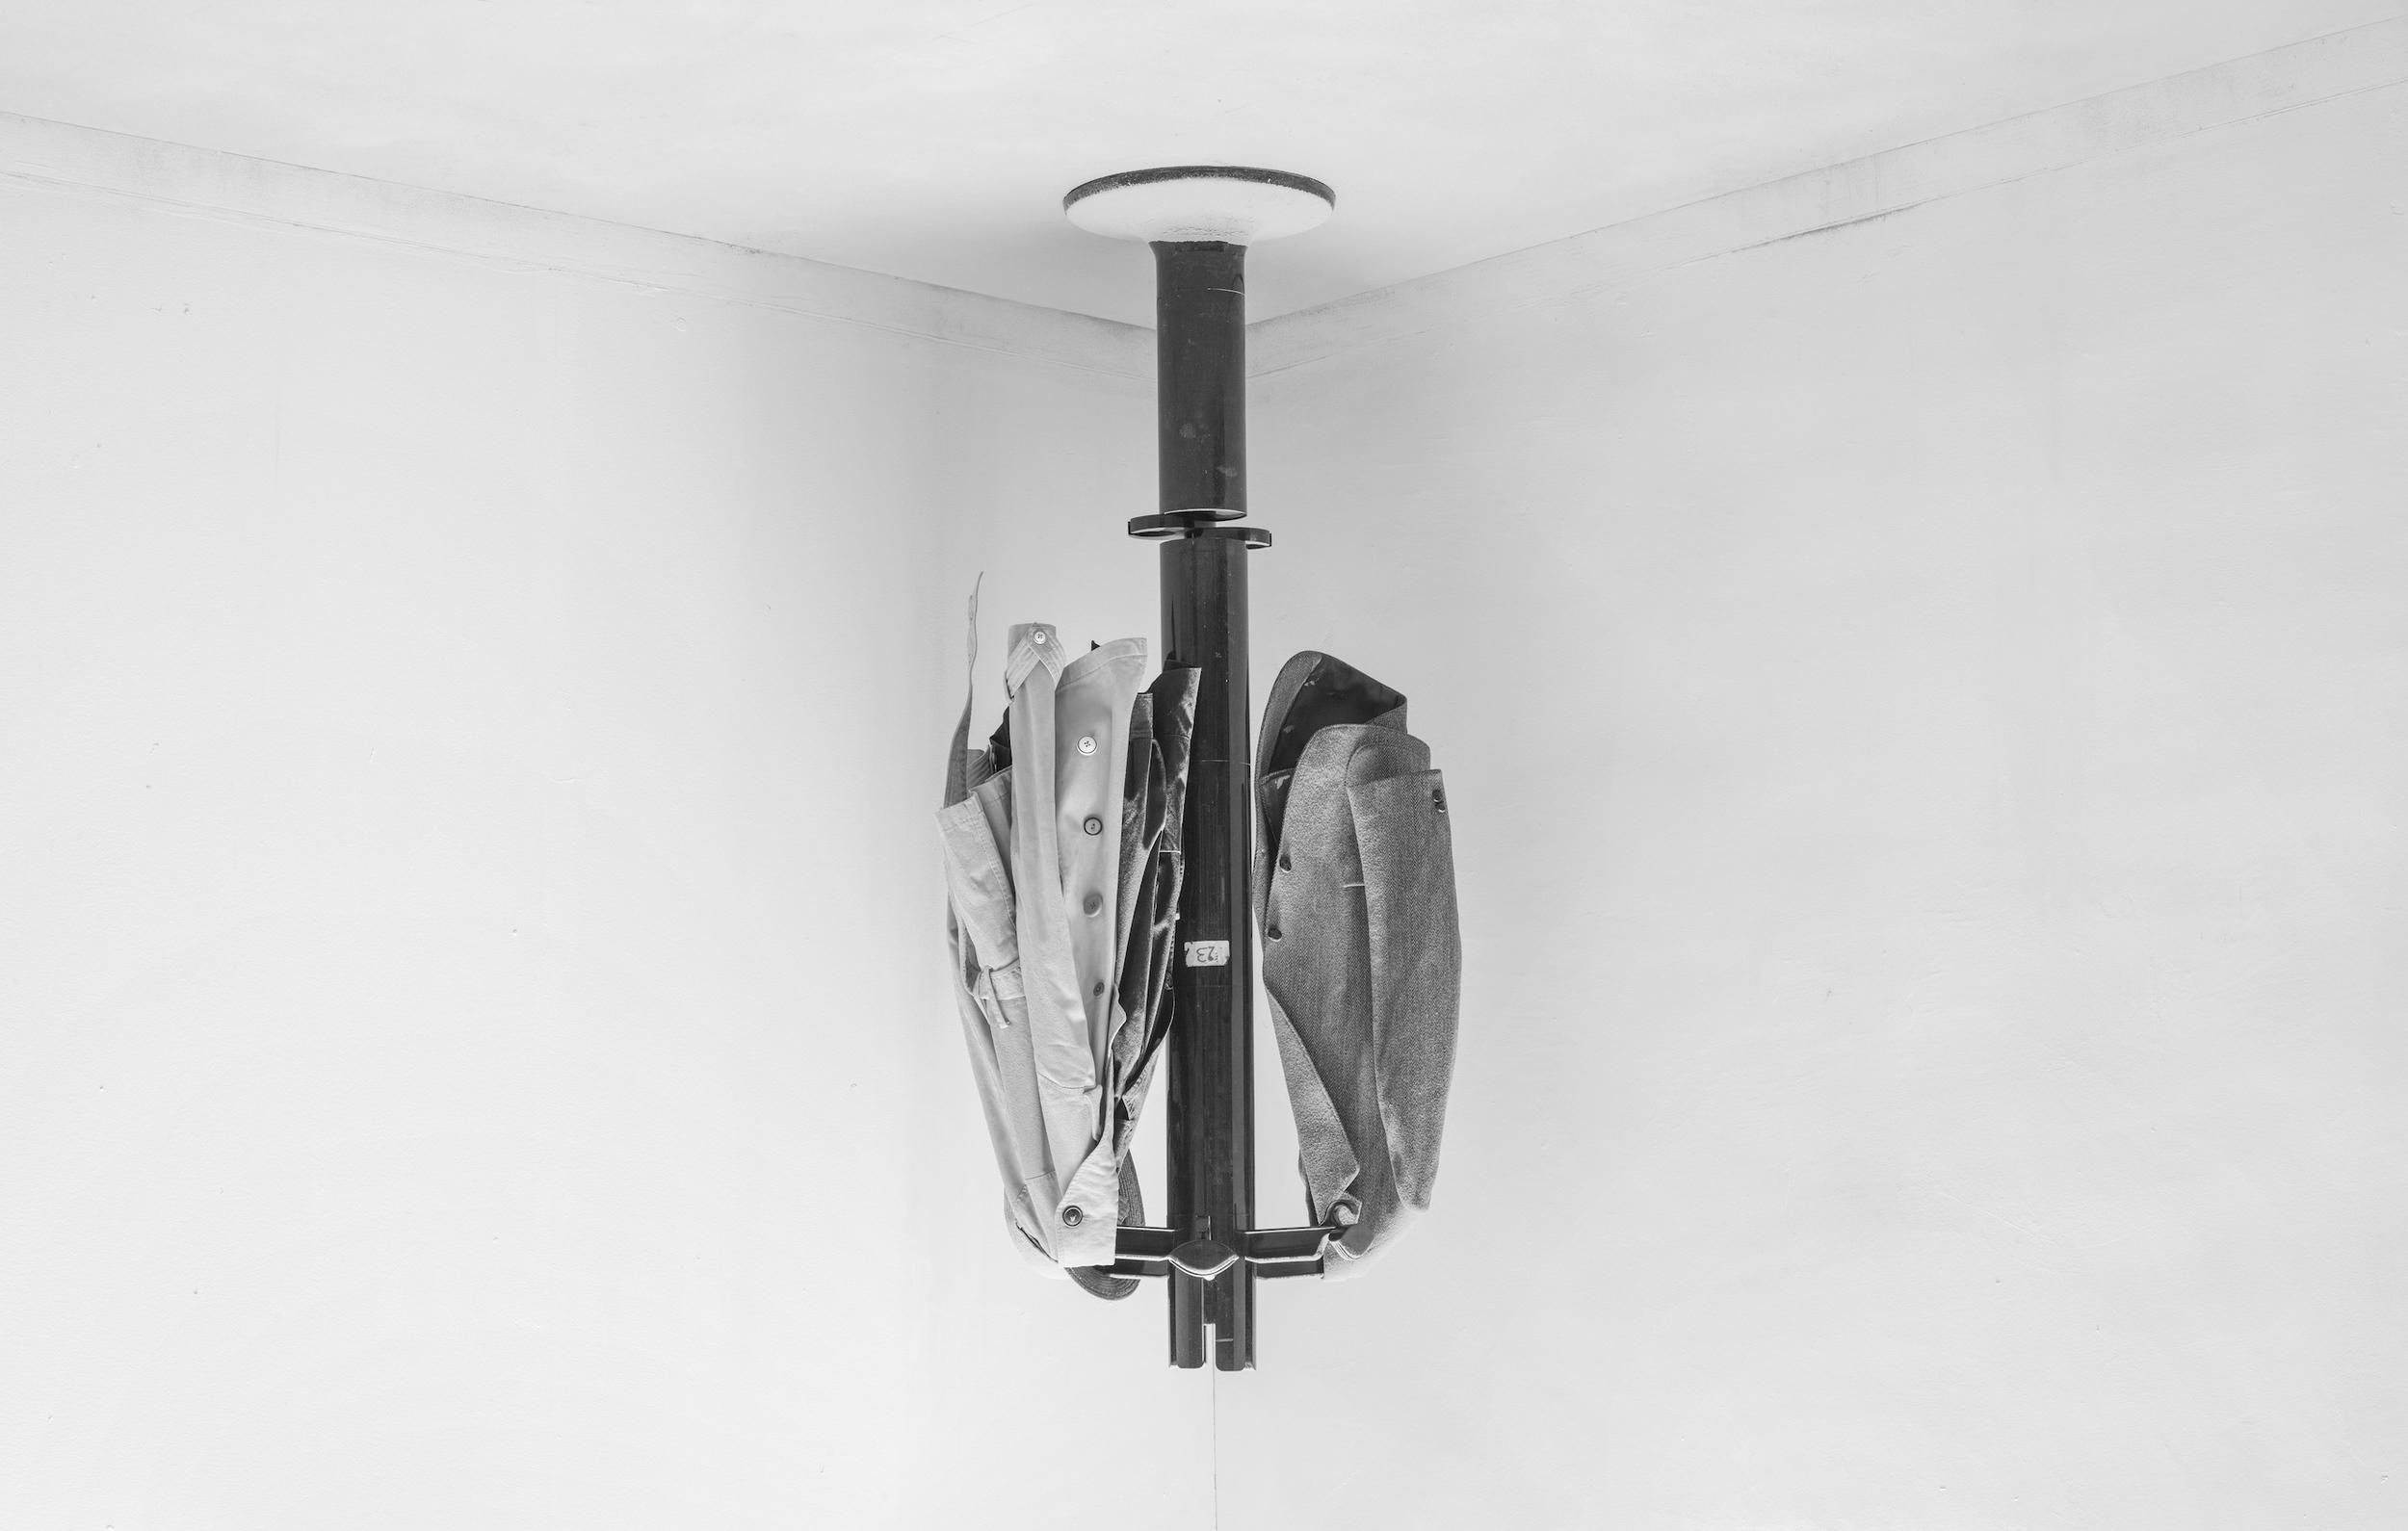 Ji Zhou 计洲, Spectacle No.5 景之五, 2013, Ultra Giclee 艺术微喷, 150 x 236 cm